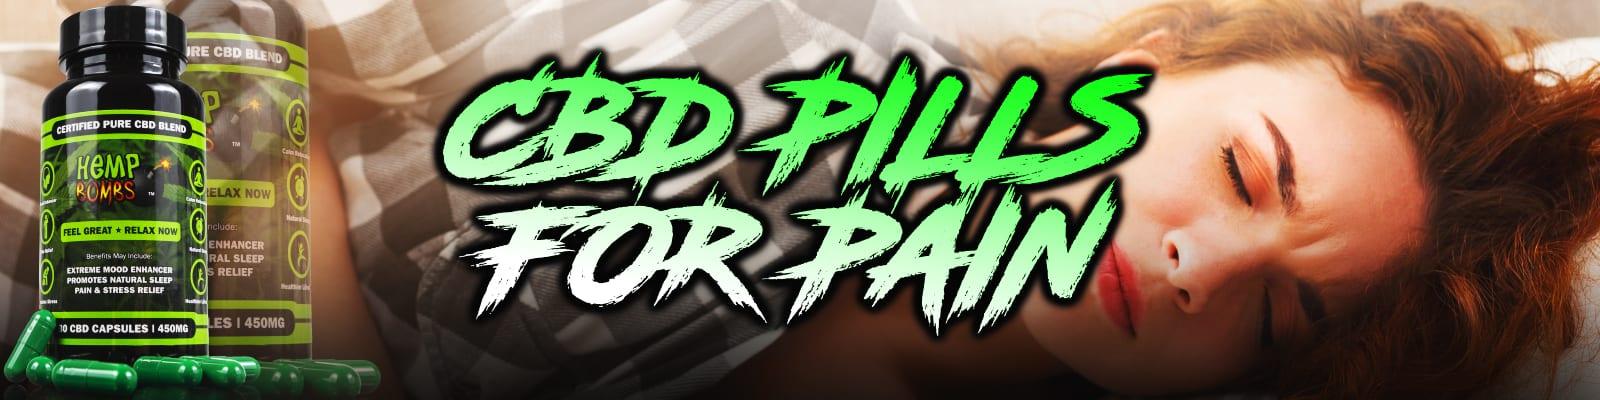 CBD Pills for Pain